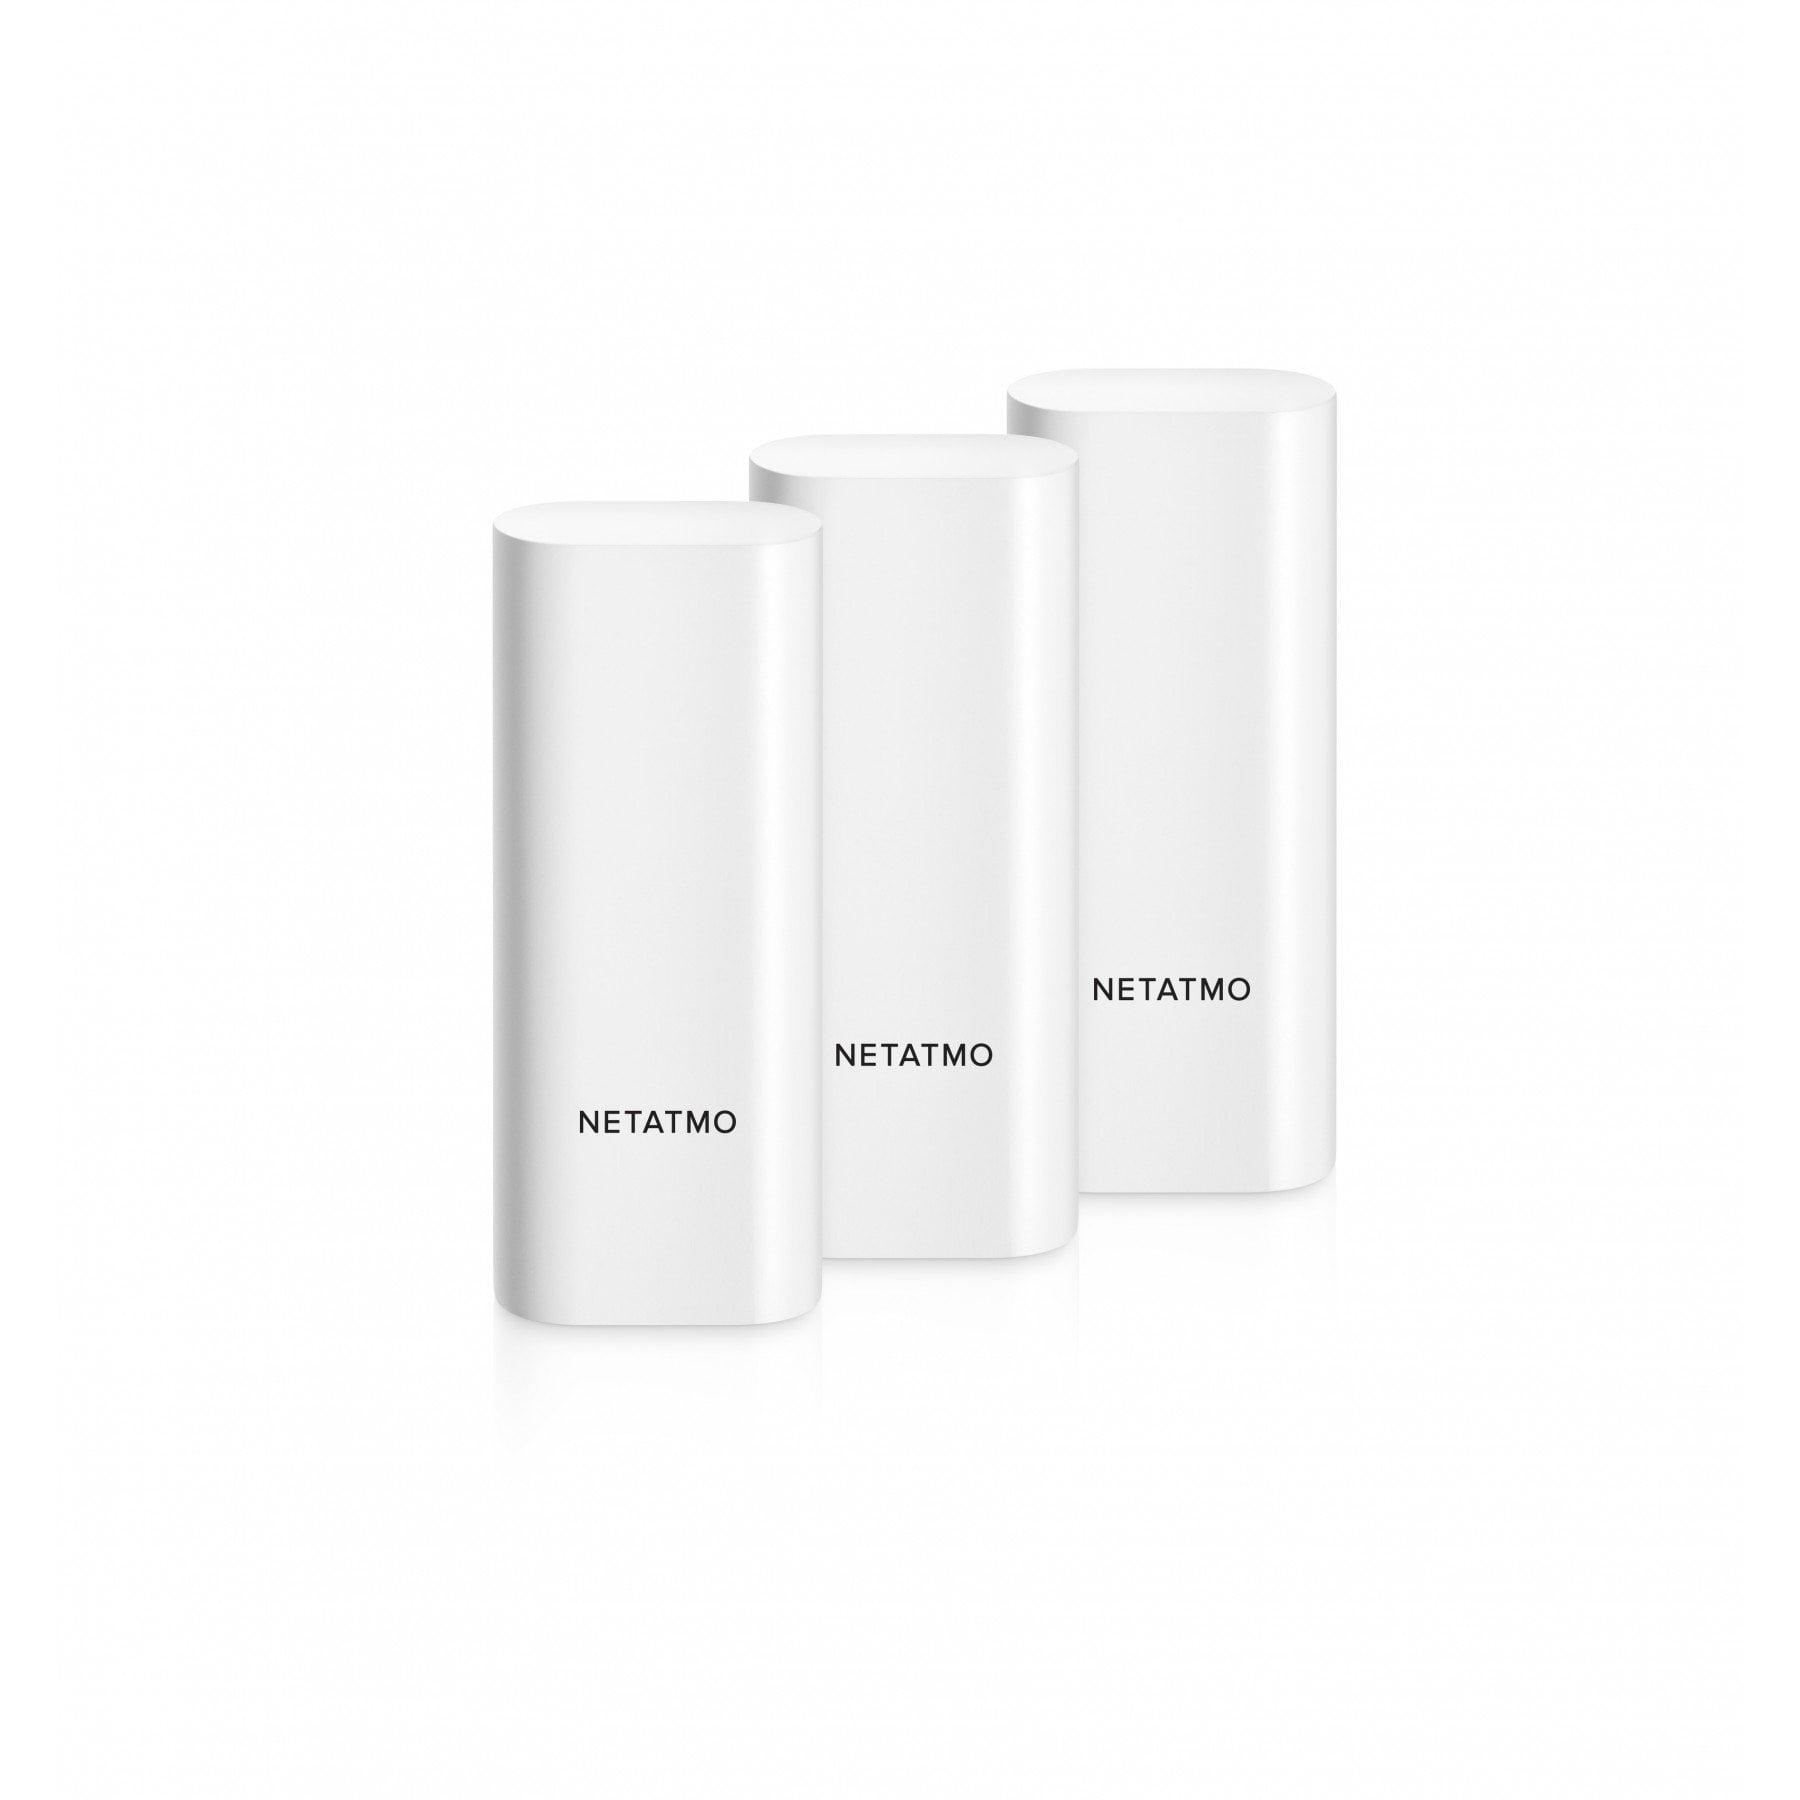 Netatmo is also launching Siren and Window / Door sensors for the US market. Compatible with HomeKit?